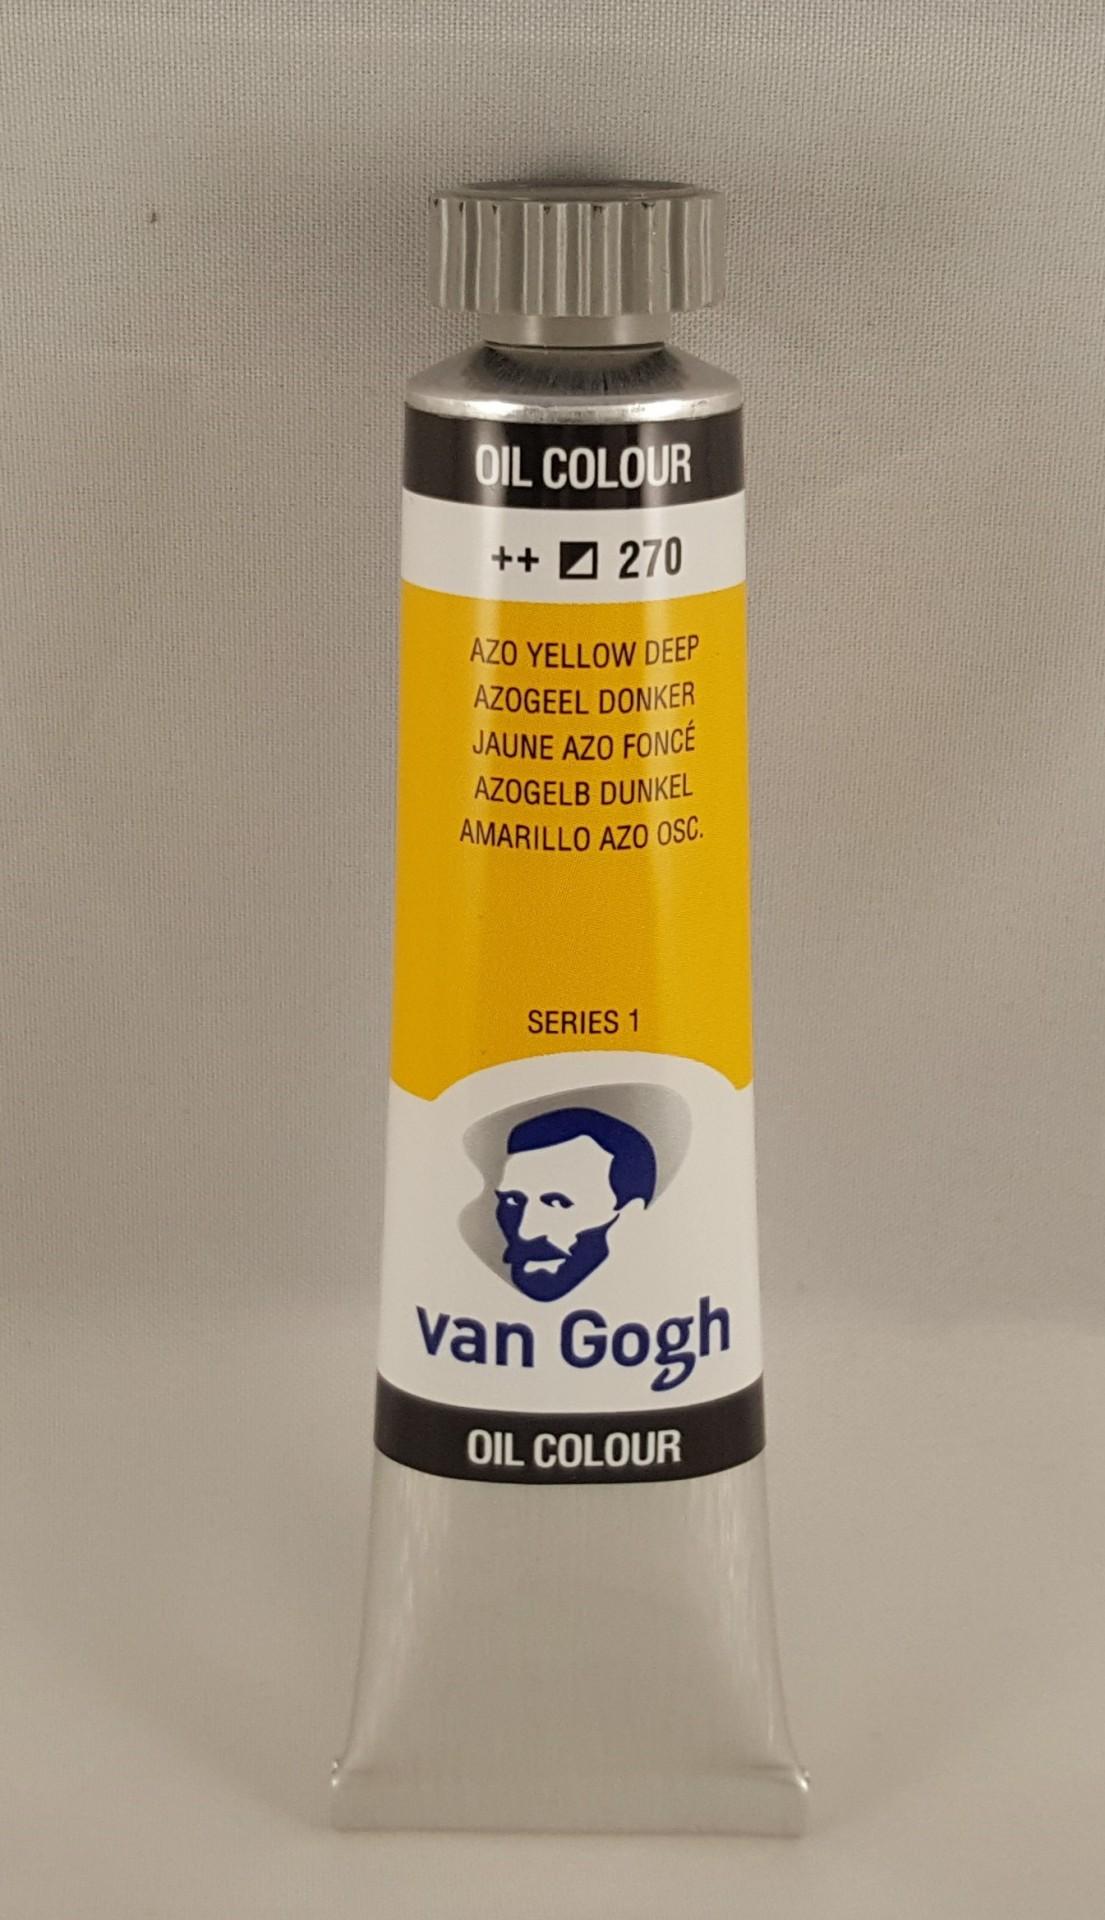 Tinta de óleo Van Gogh azo yellow deep